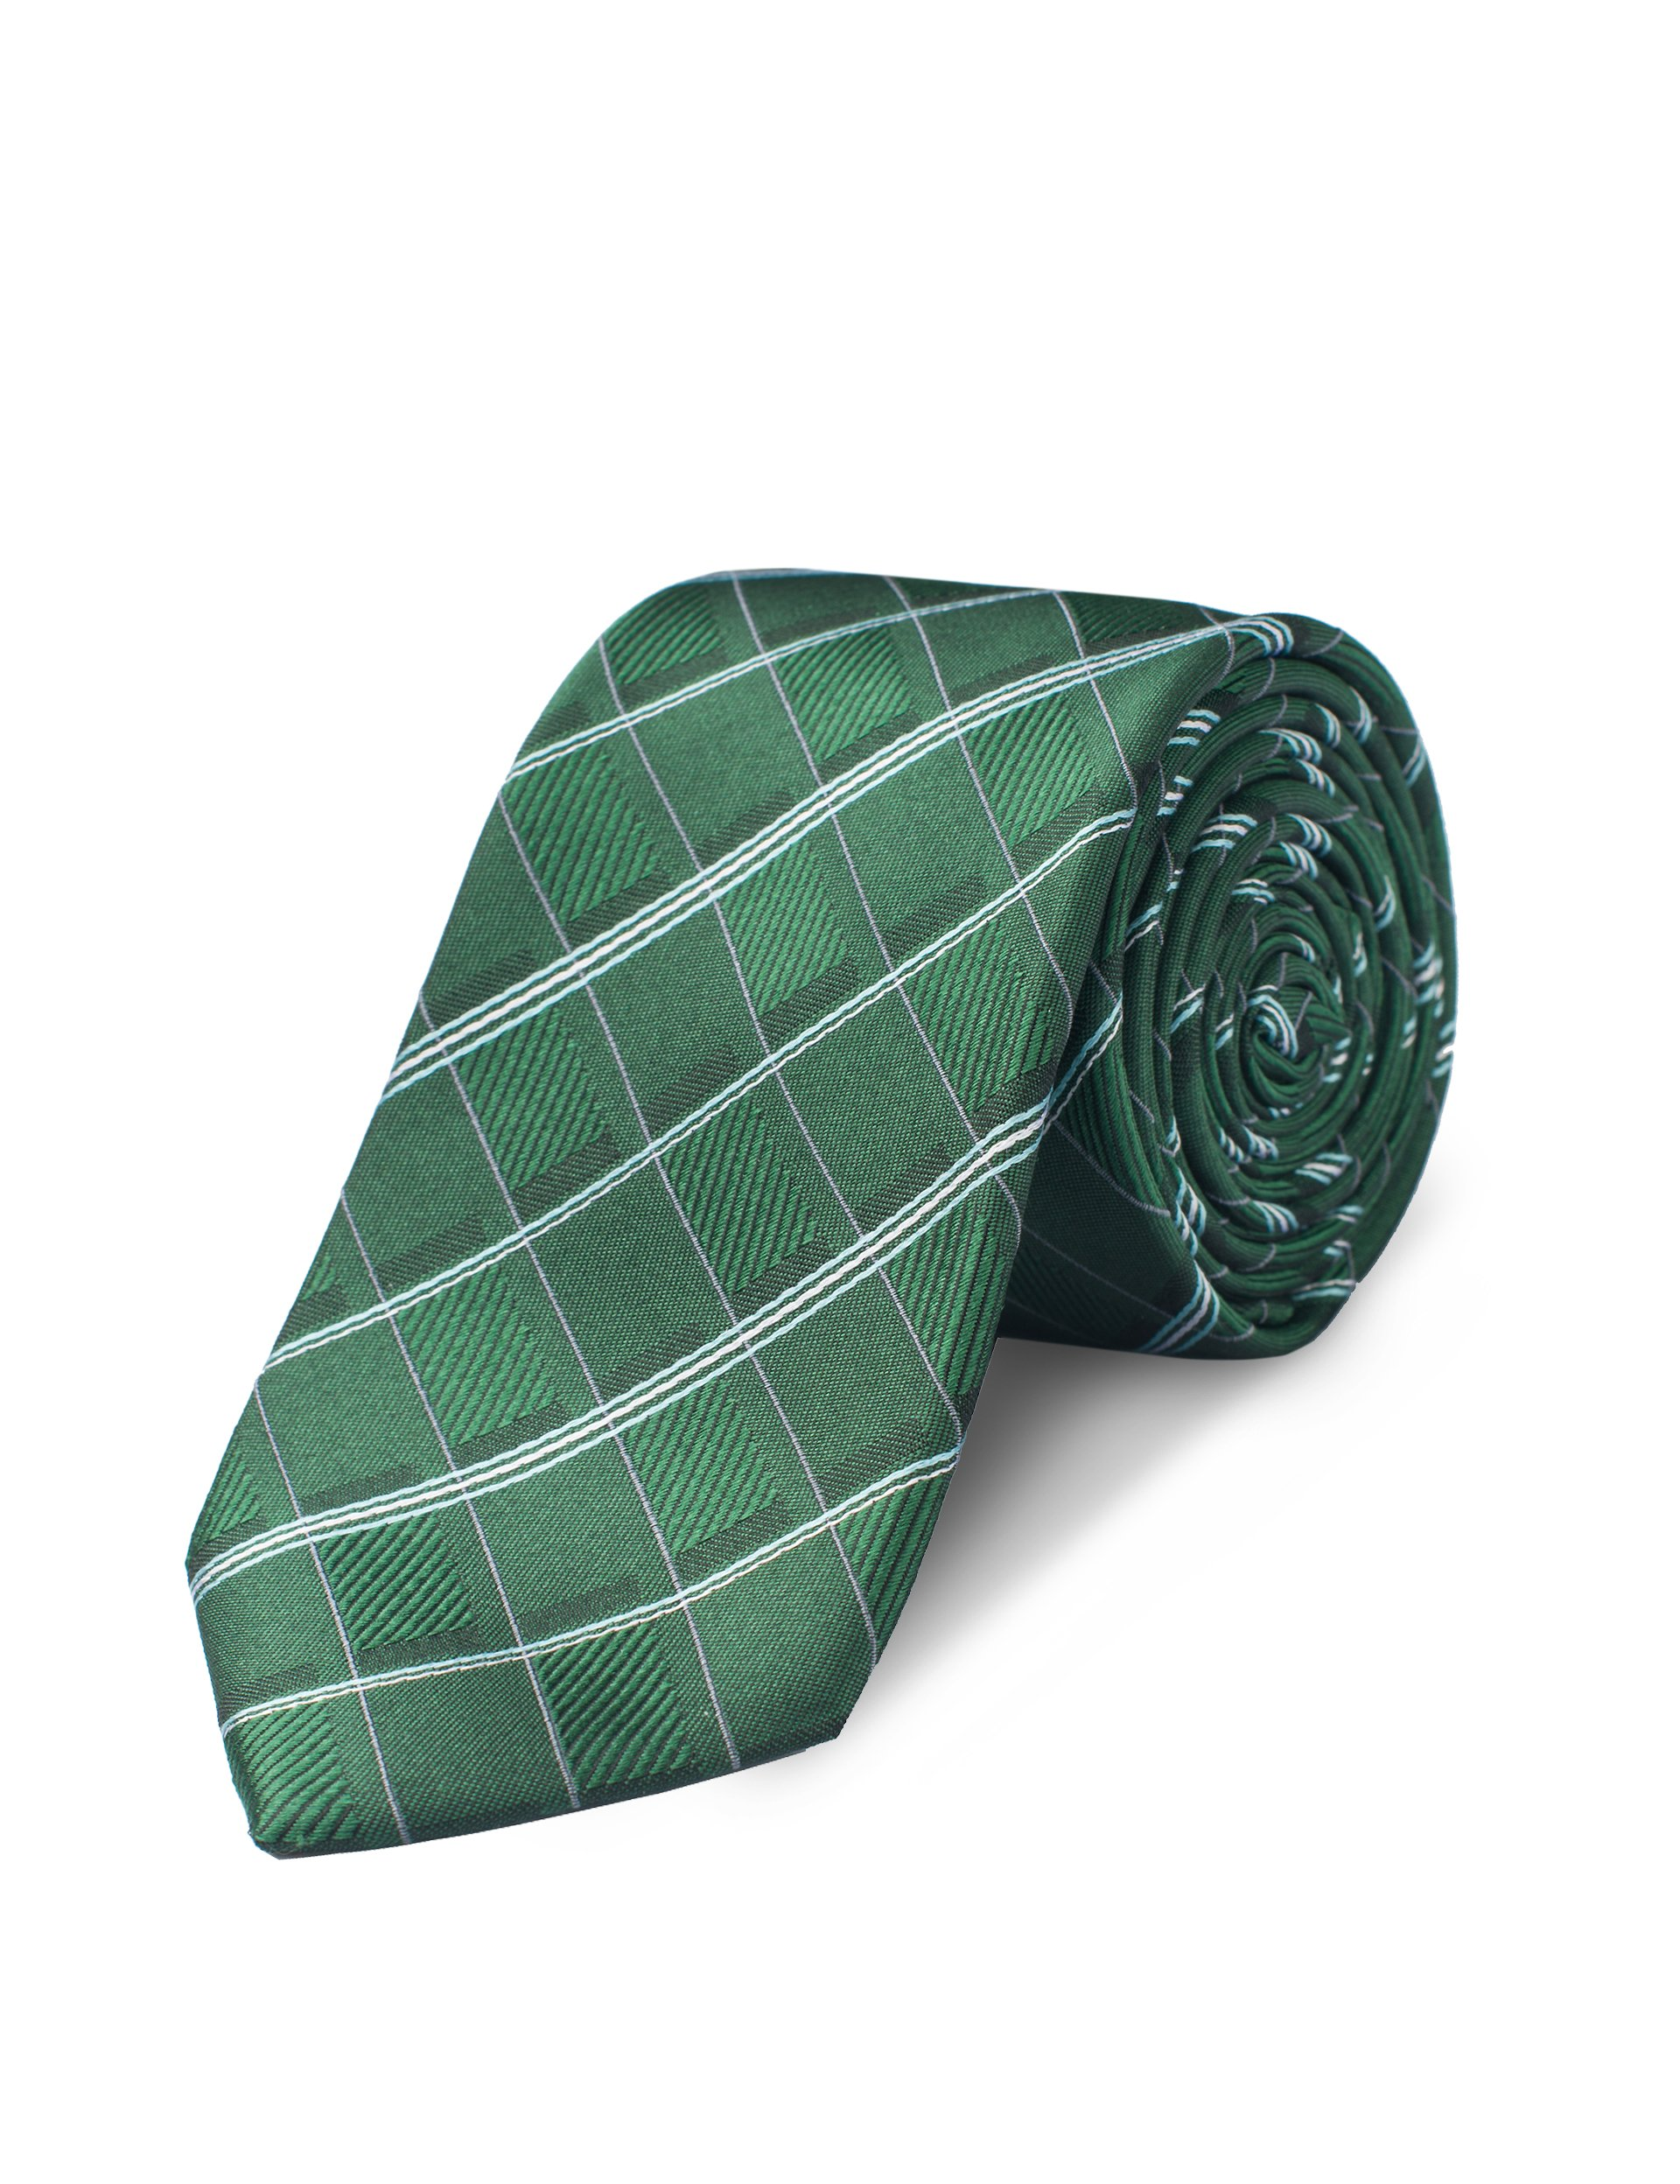 ORIGIN TIES Men's Fashion Silk Stripes 2.5 inches Skinny Tie Green